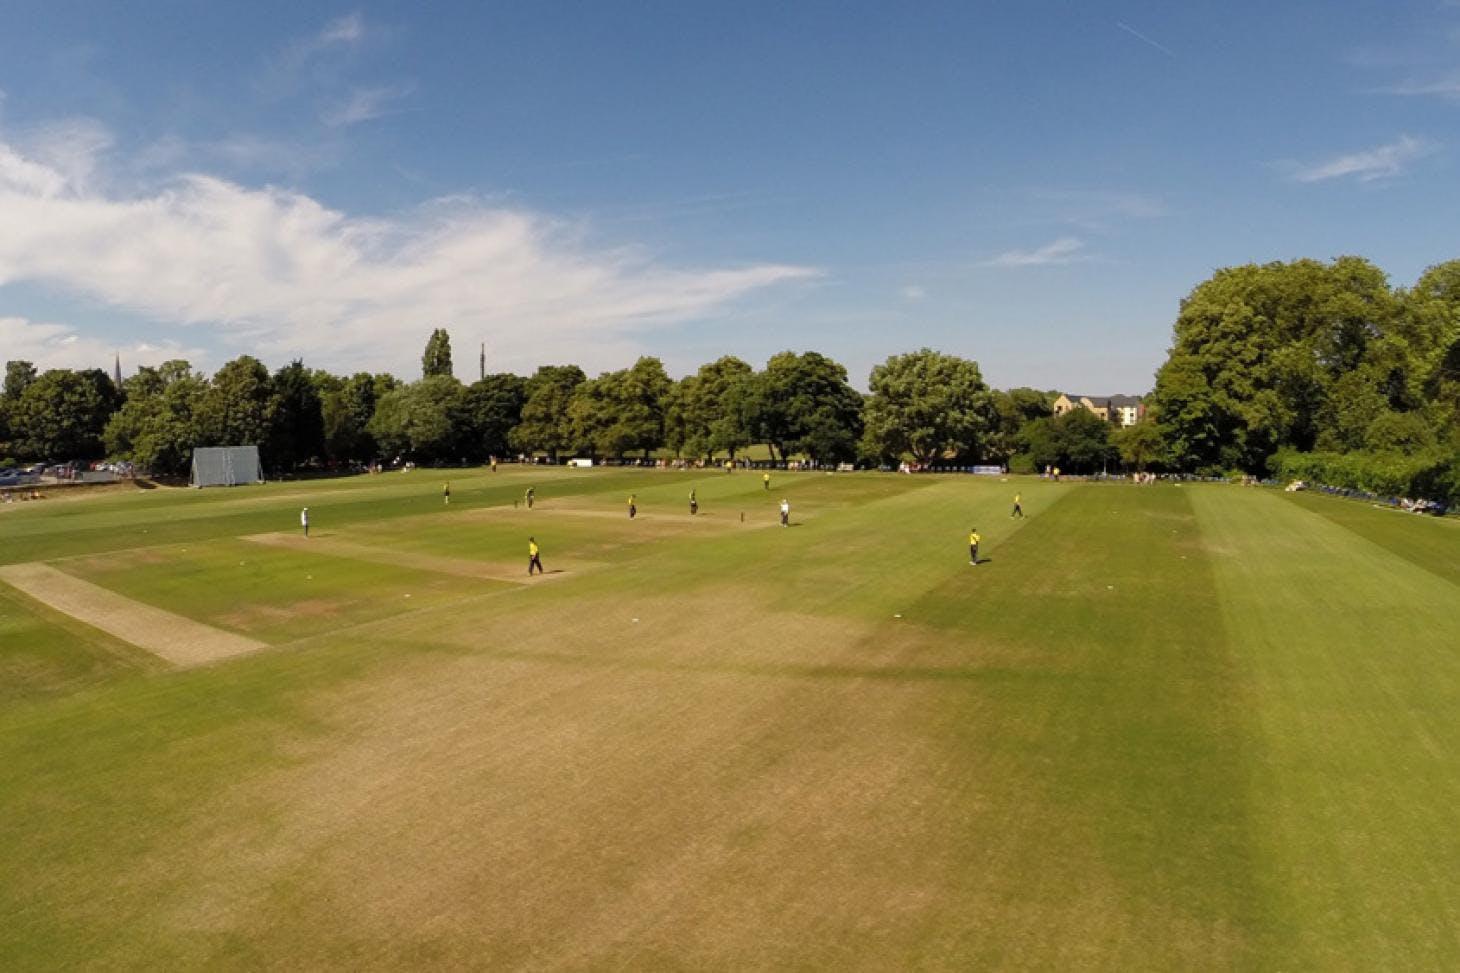 Bexley Cricket Club Full size | Grass cricket facilities